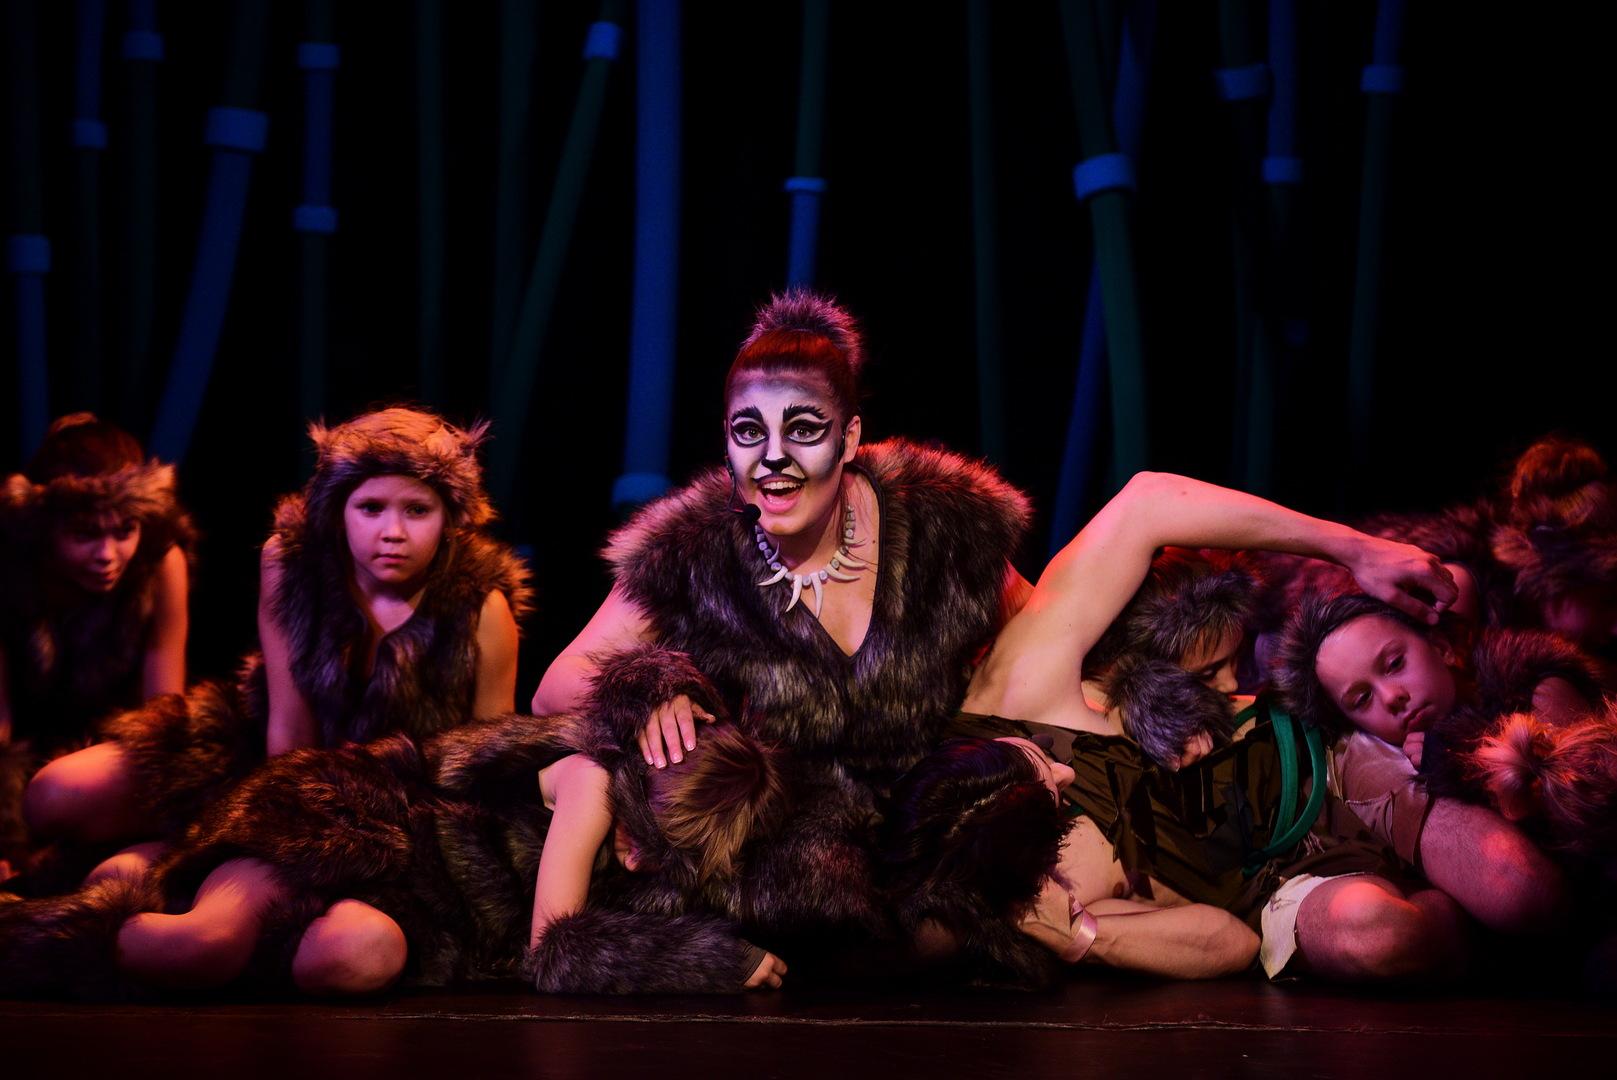 Театр-фото-музыка-МХ-2-05-2017